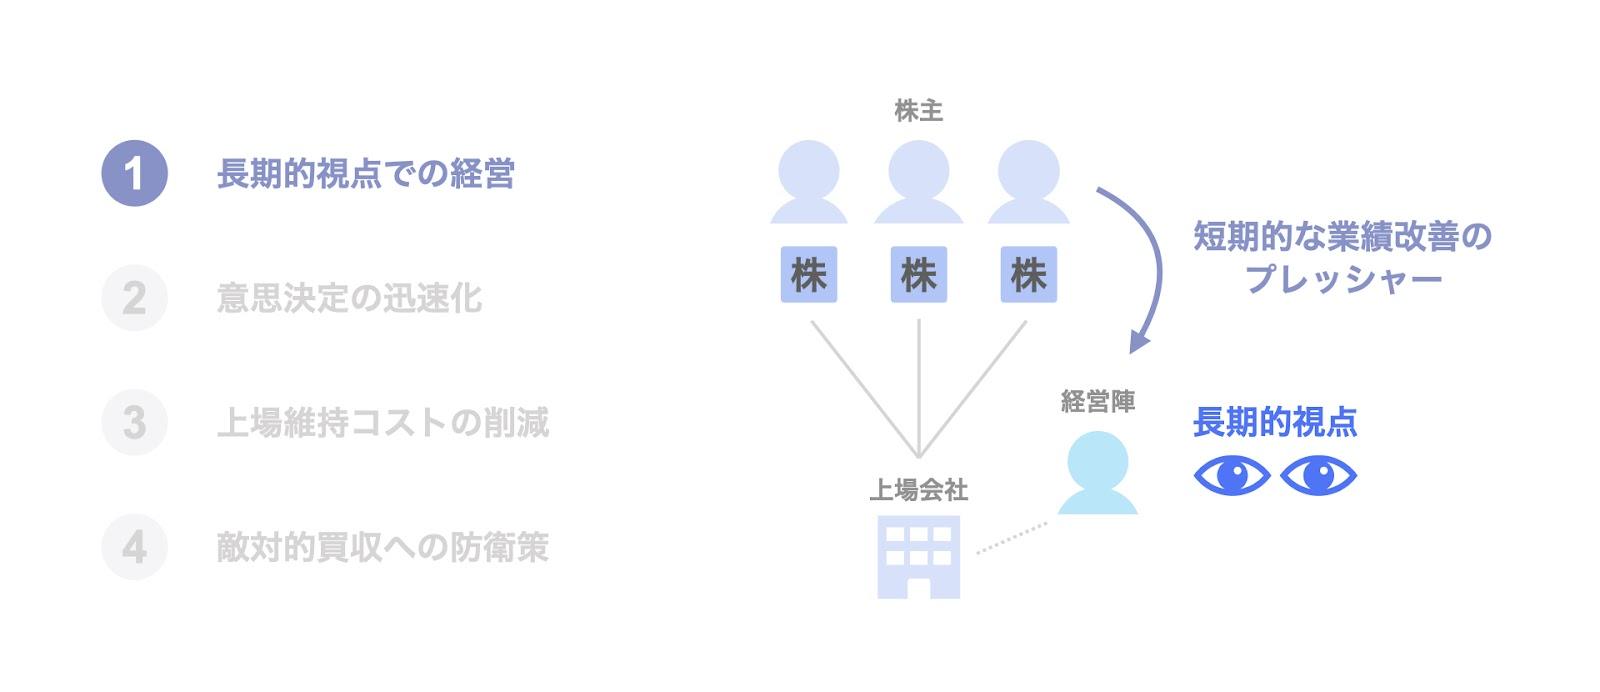 MBOによる非公開化の目的(メリット)①長期的視点での経営